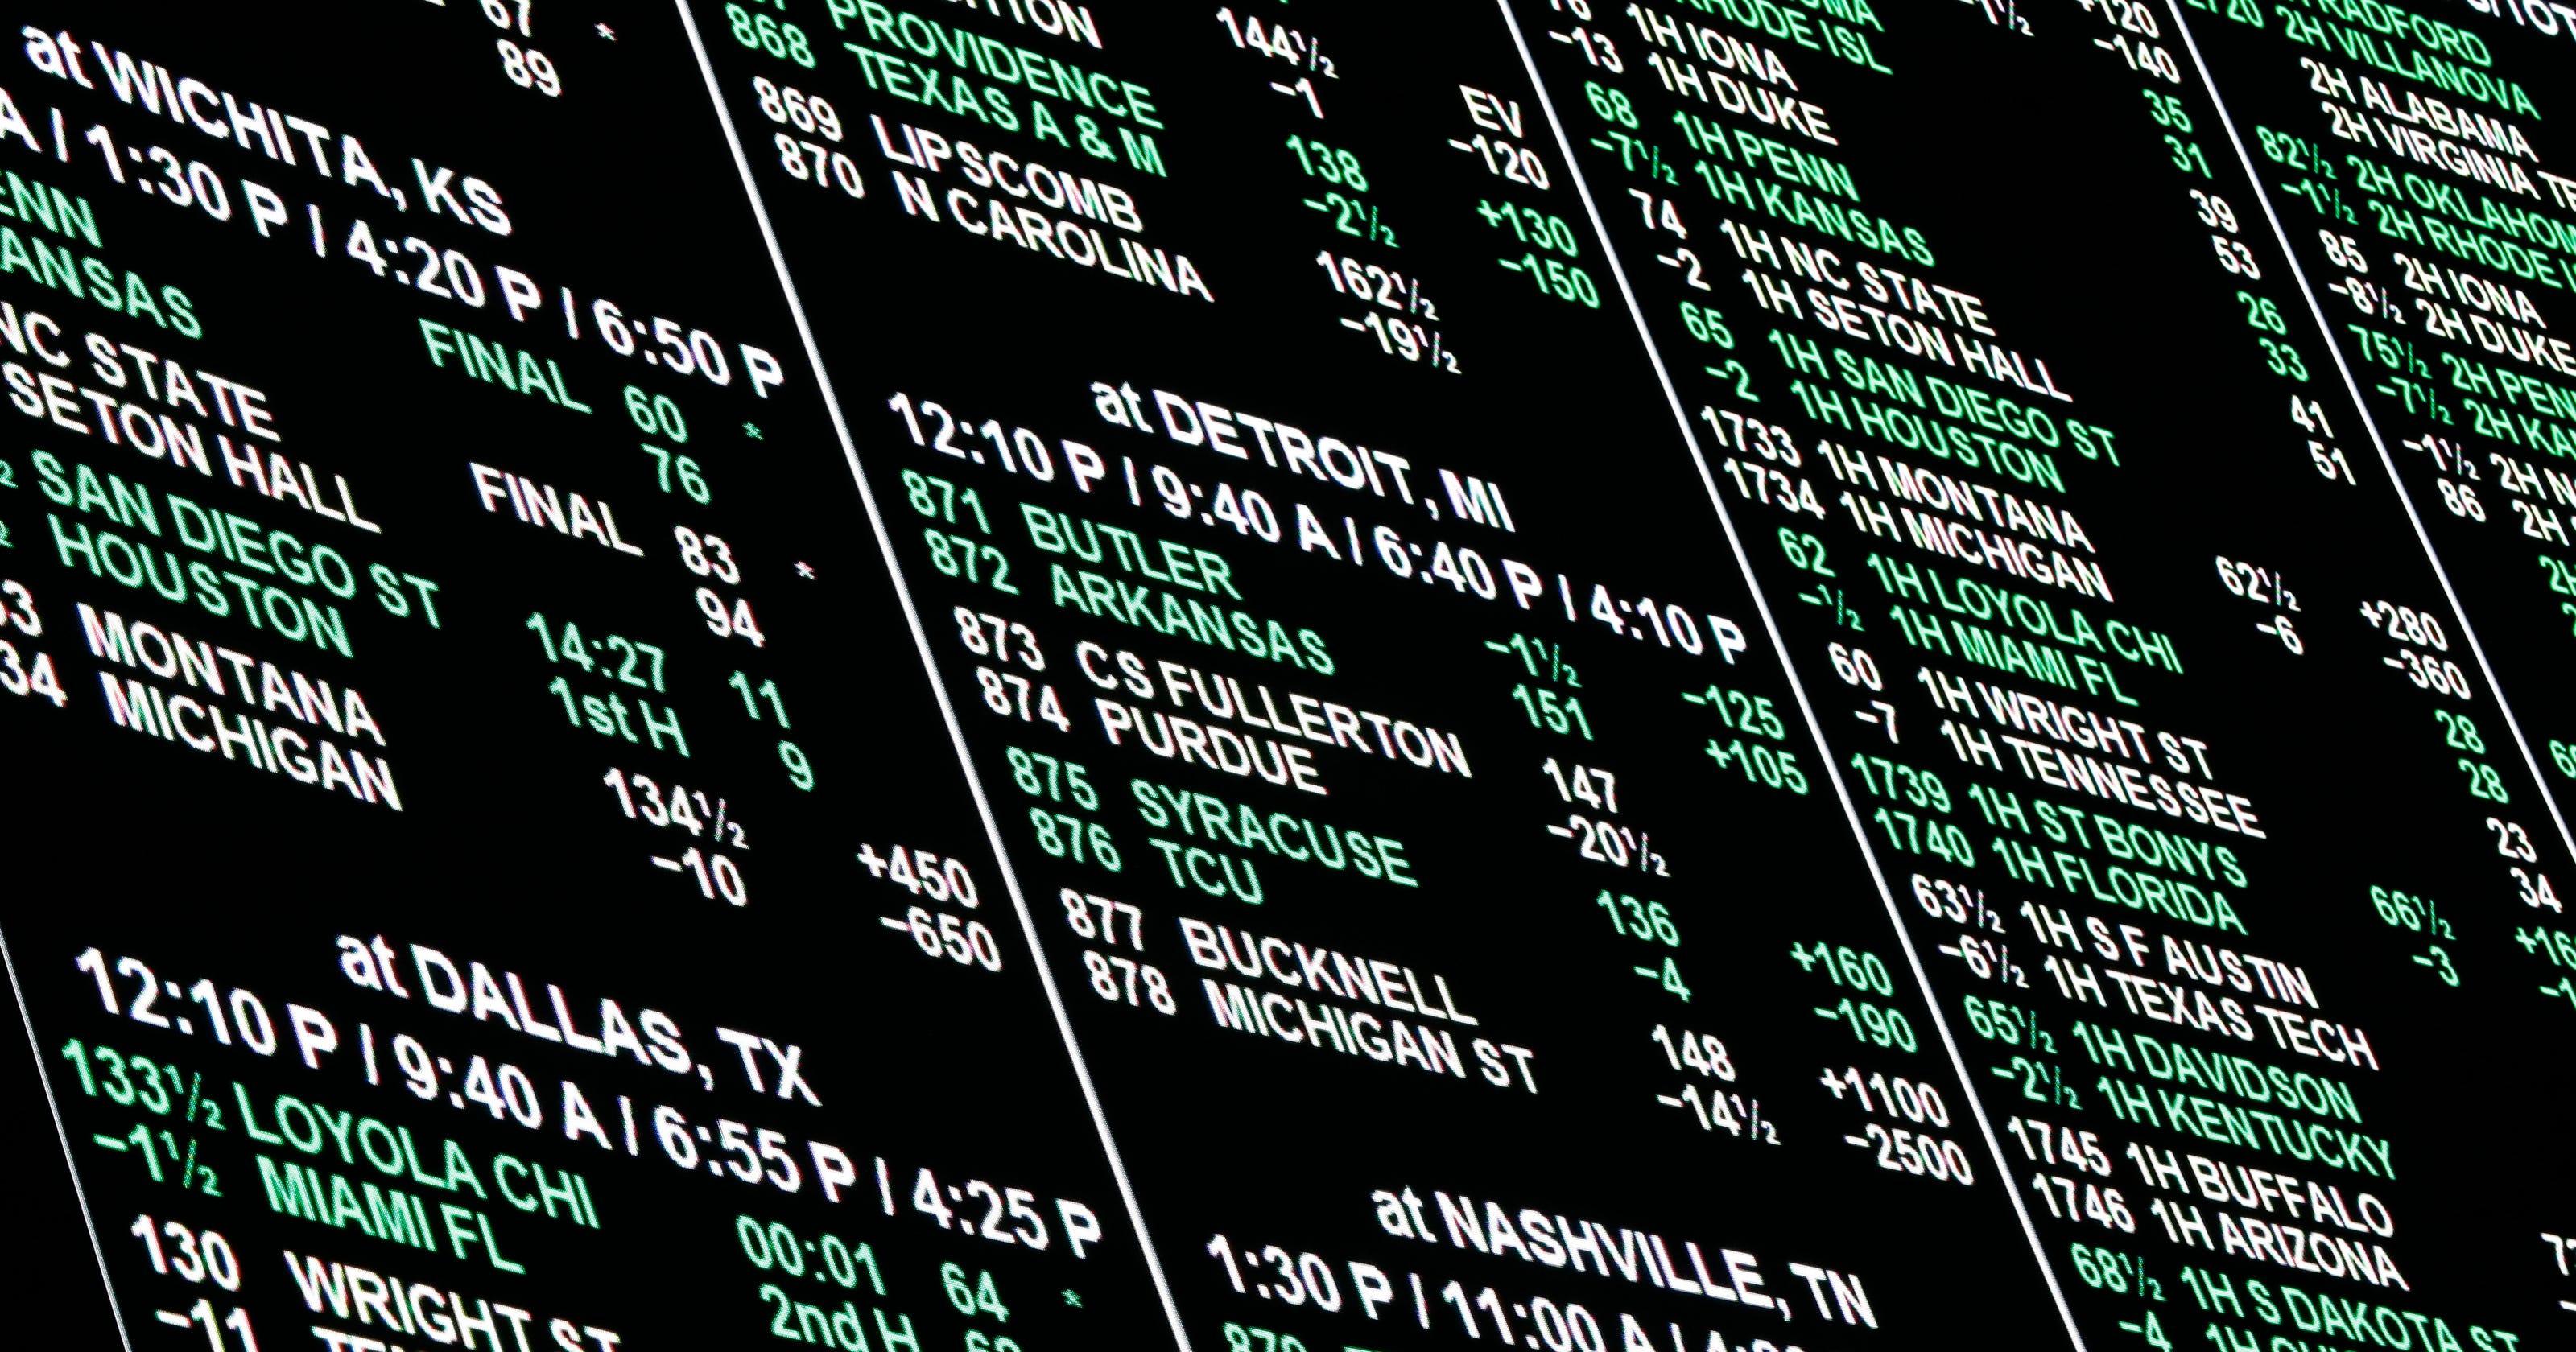 2 more Vicksburg casinos open sports betting